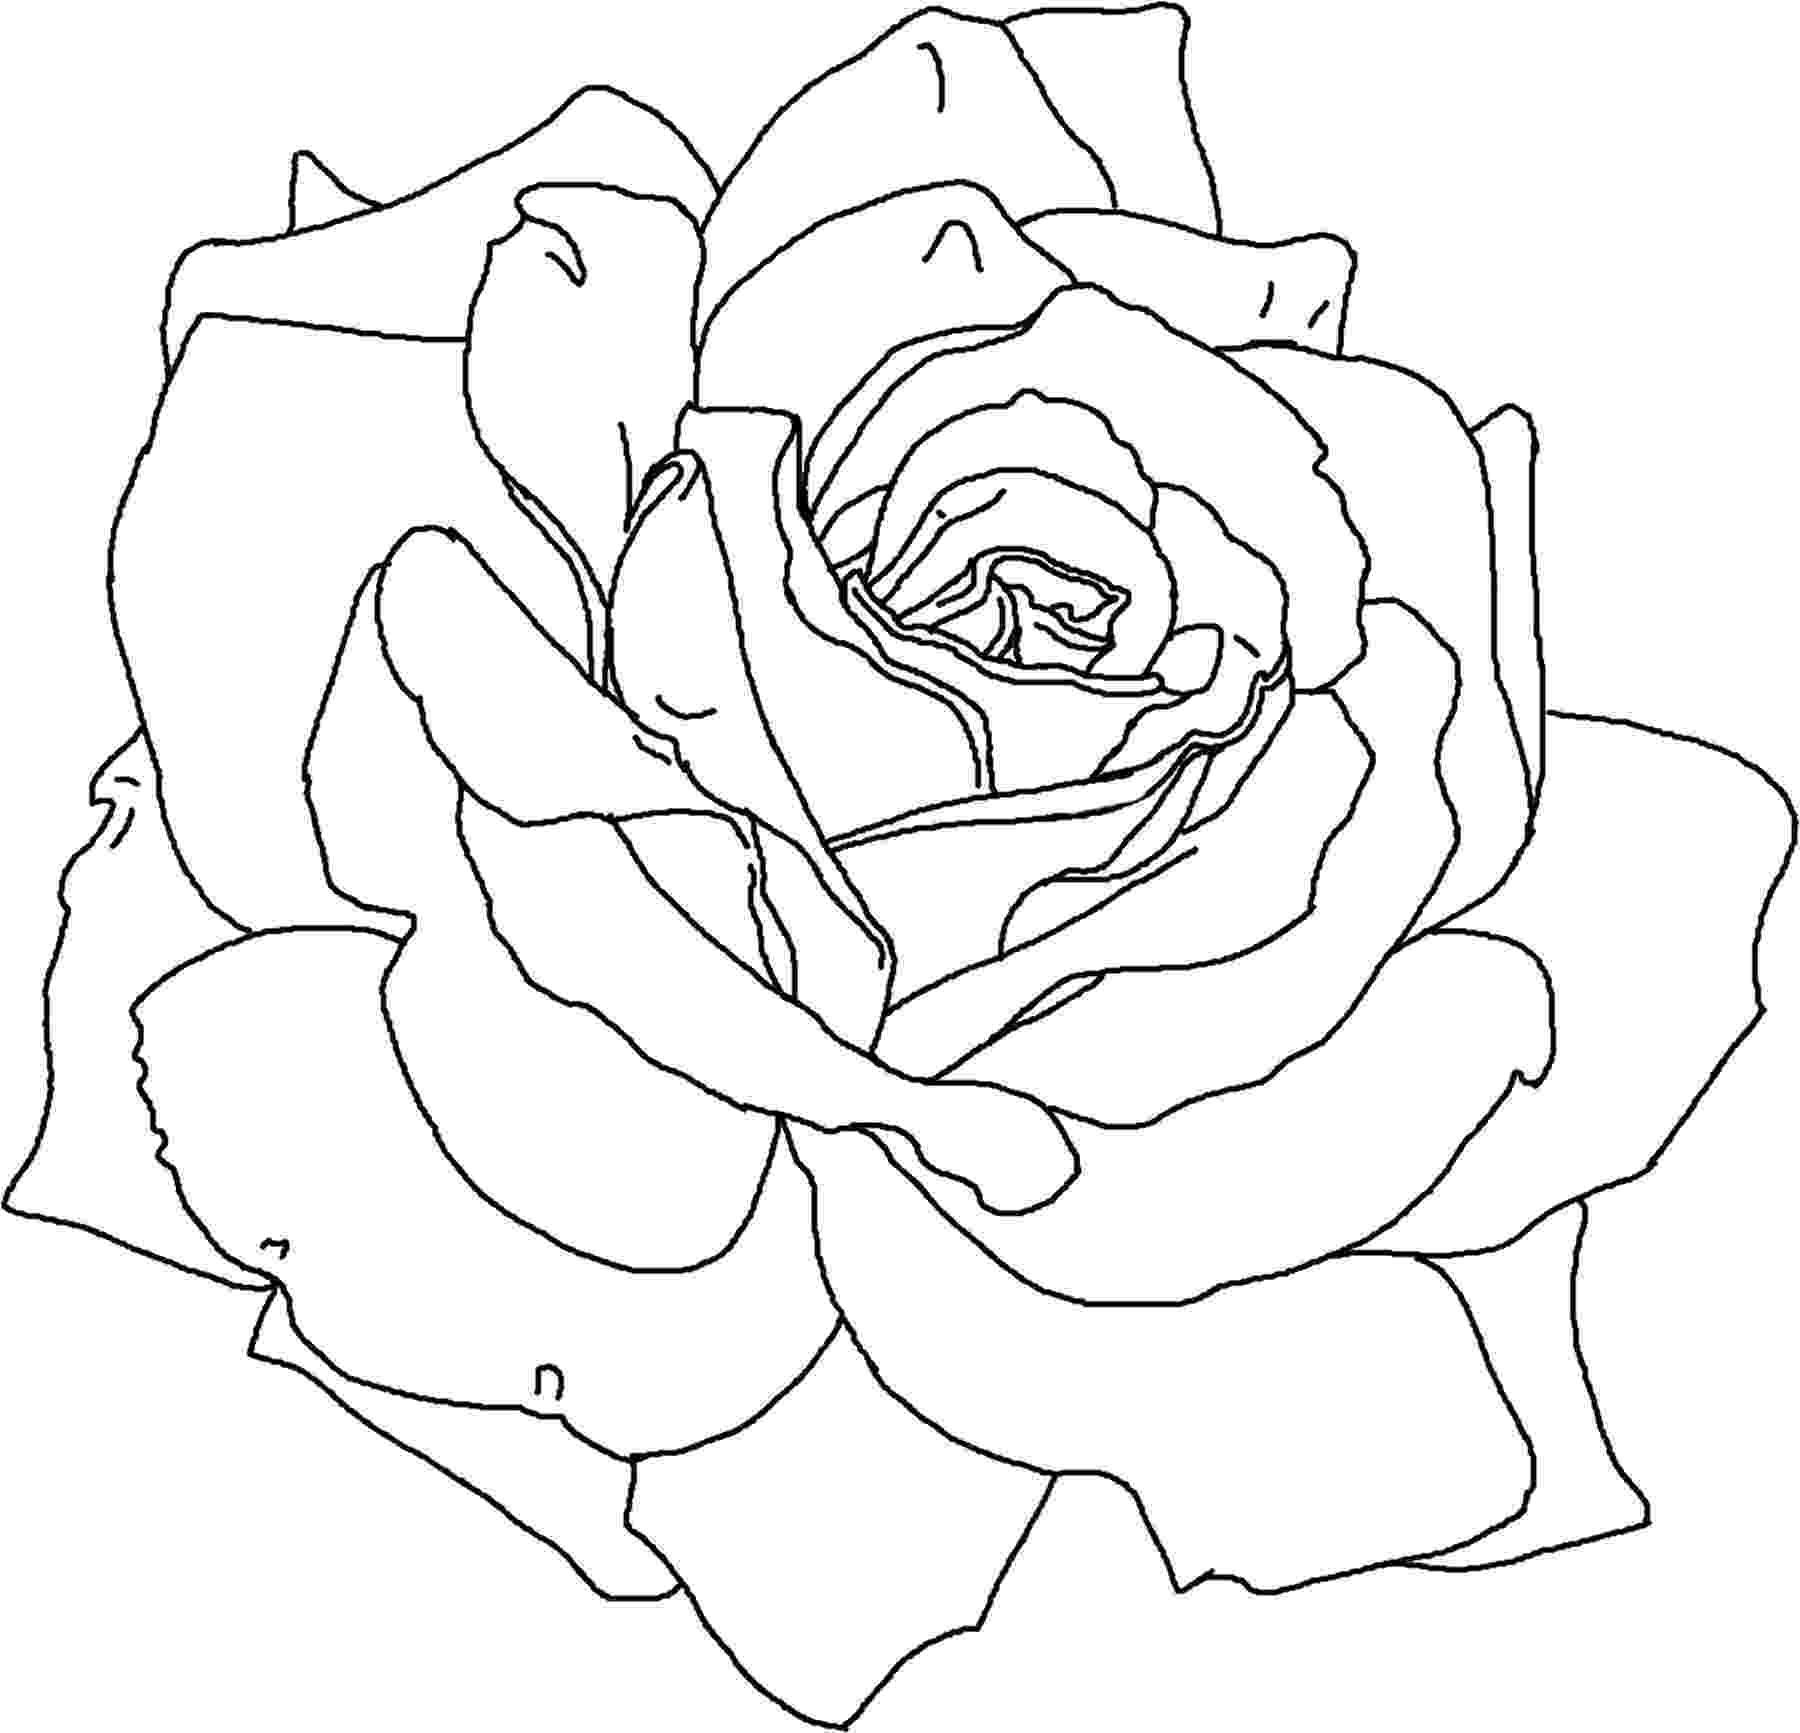 printable flower coloring pages free printable flower coloring pages for kids best pages coloring printable flower